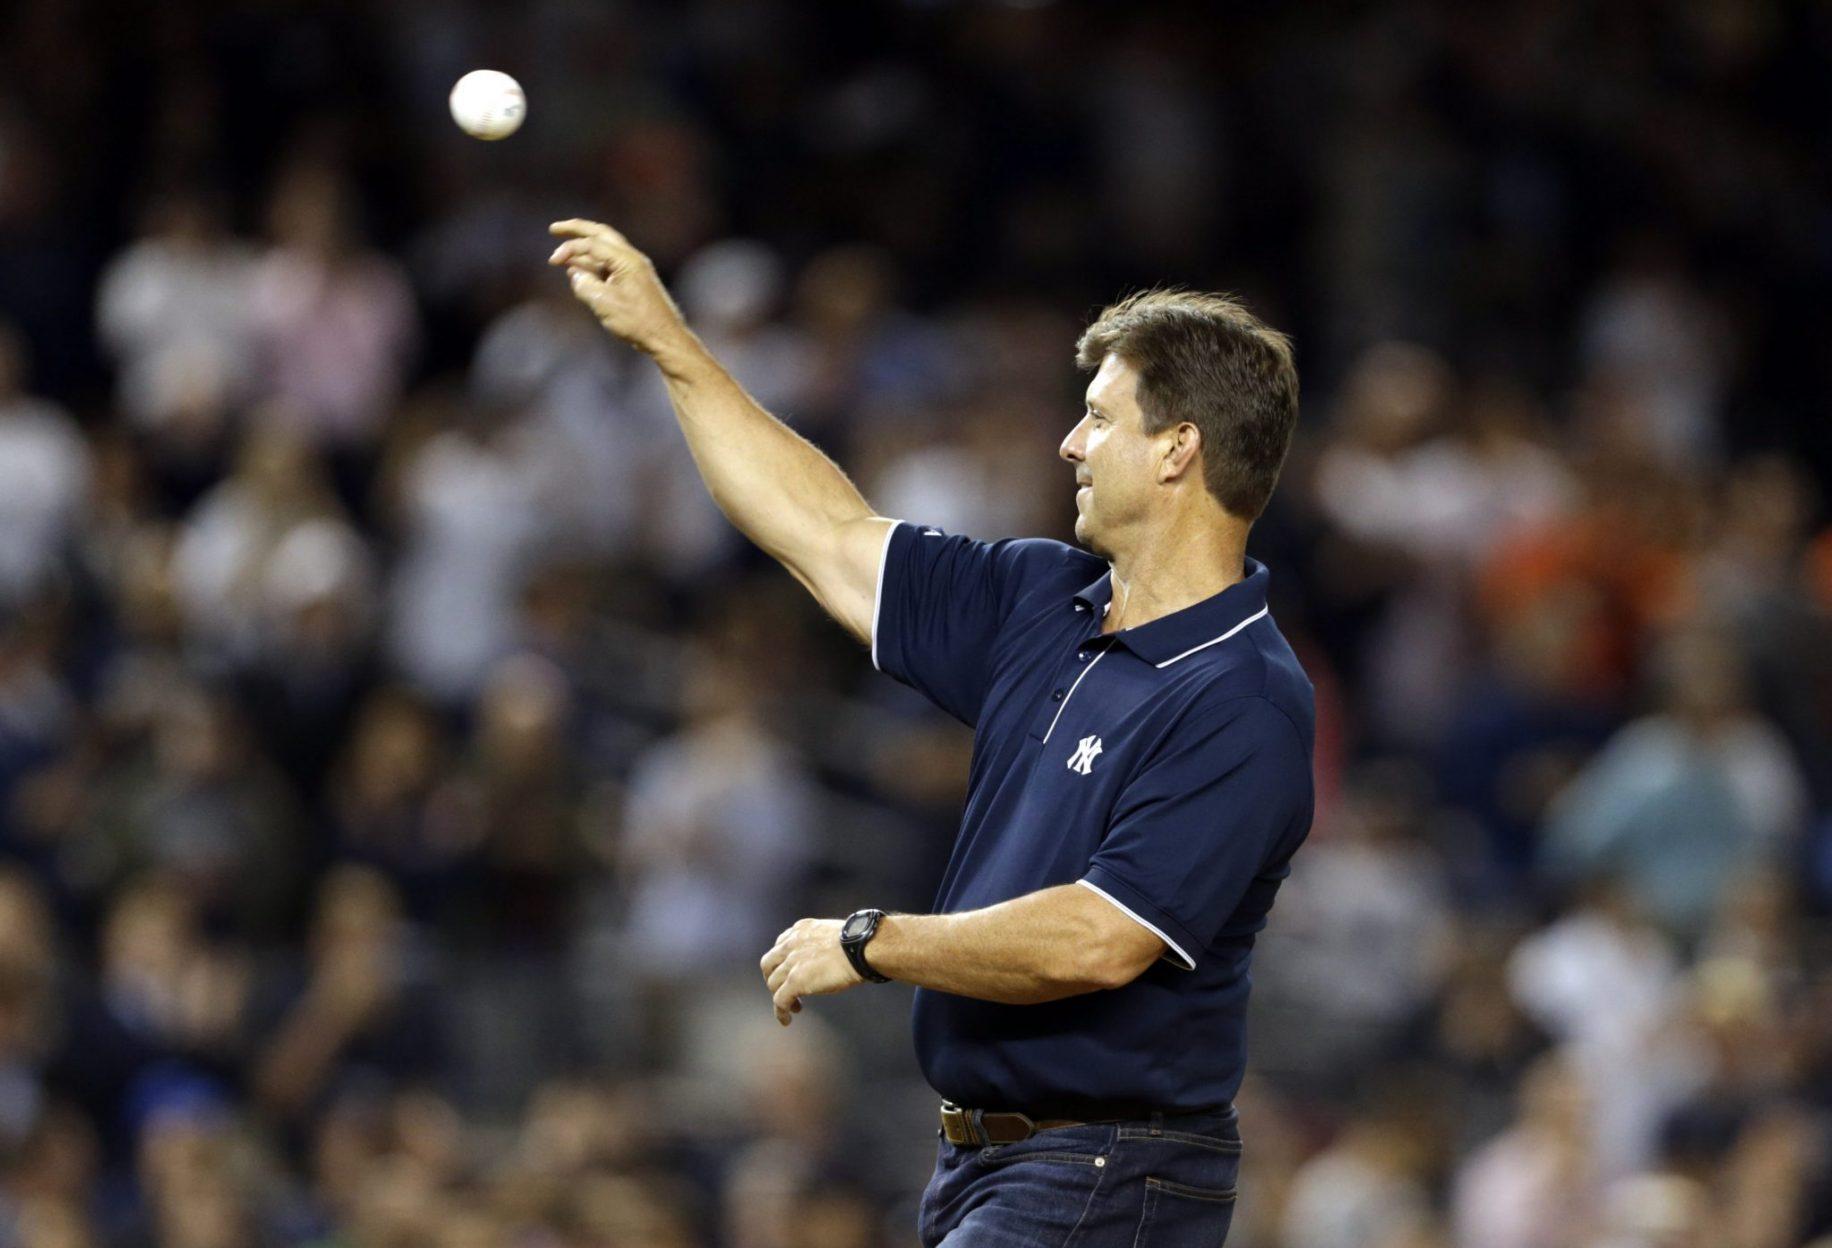 Former New York Yankees first baseman nabs coaching gig for Team USA